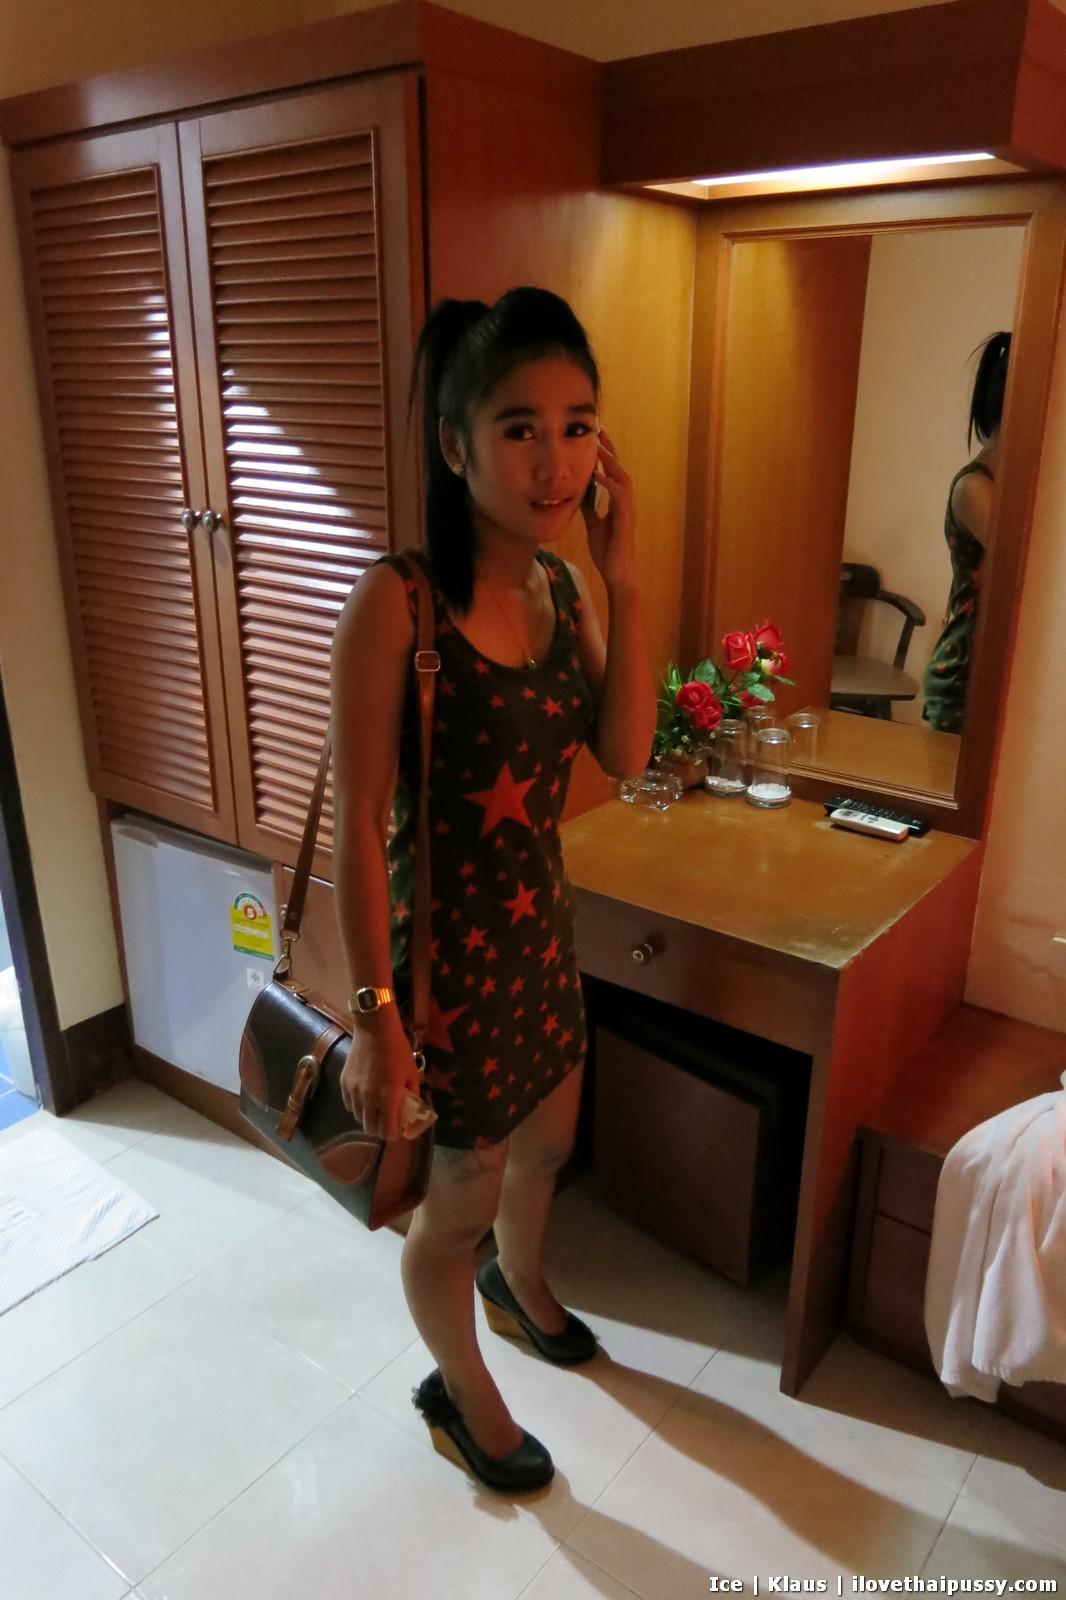 Cutie pie pattaya bargirl private short-time pics | Nude ...